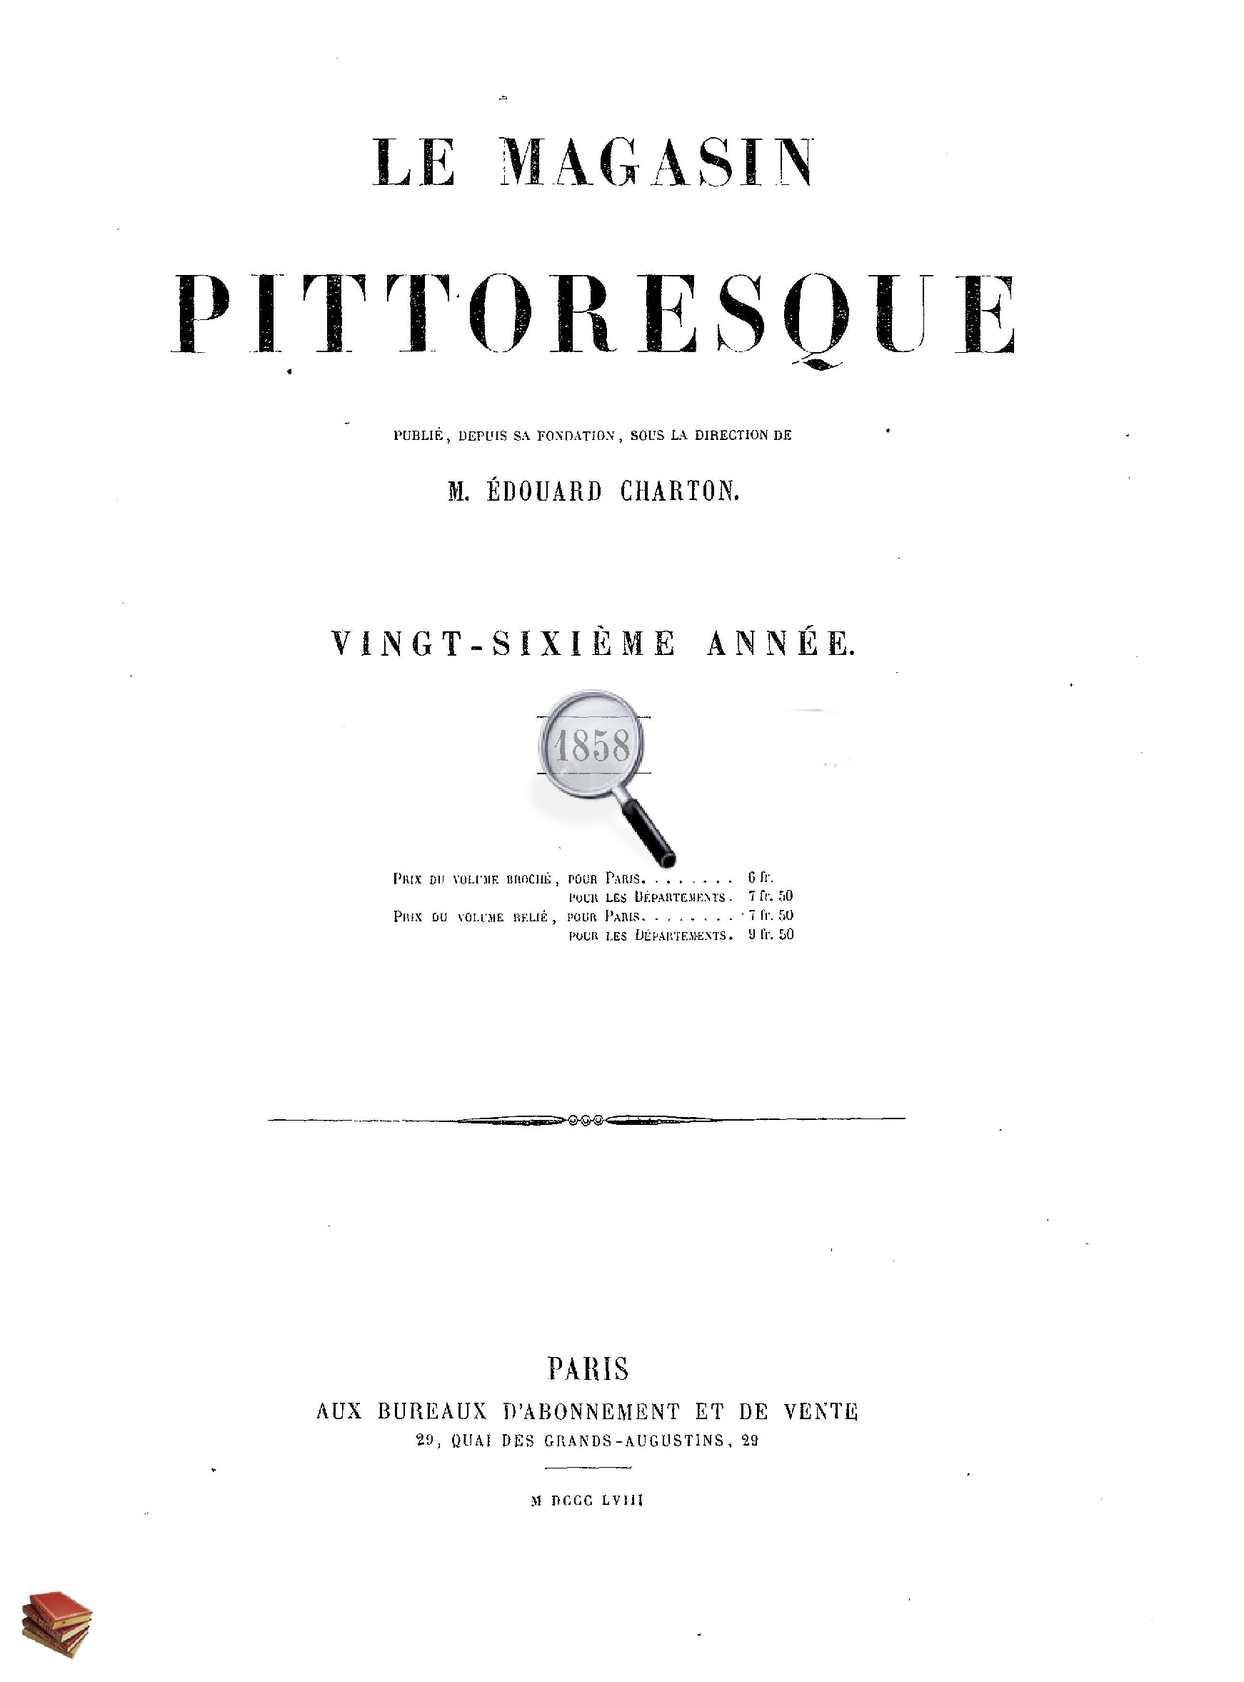 Calaméo - Le Magasin Pittoresque 1858 680cbb02857c